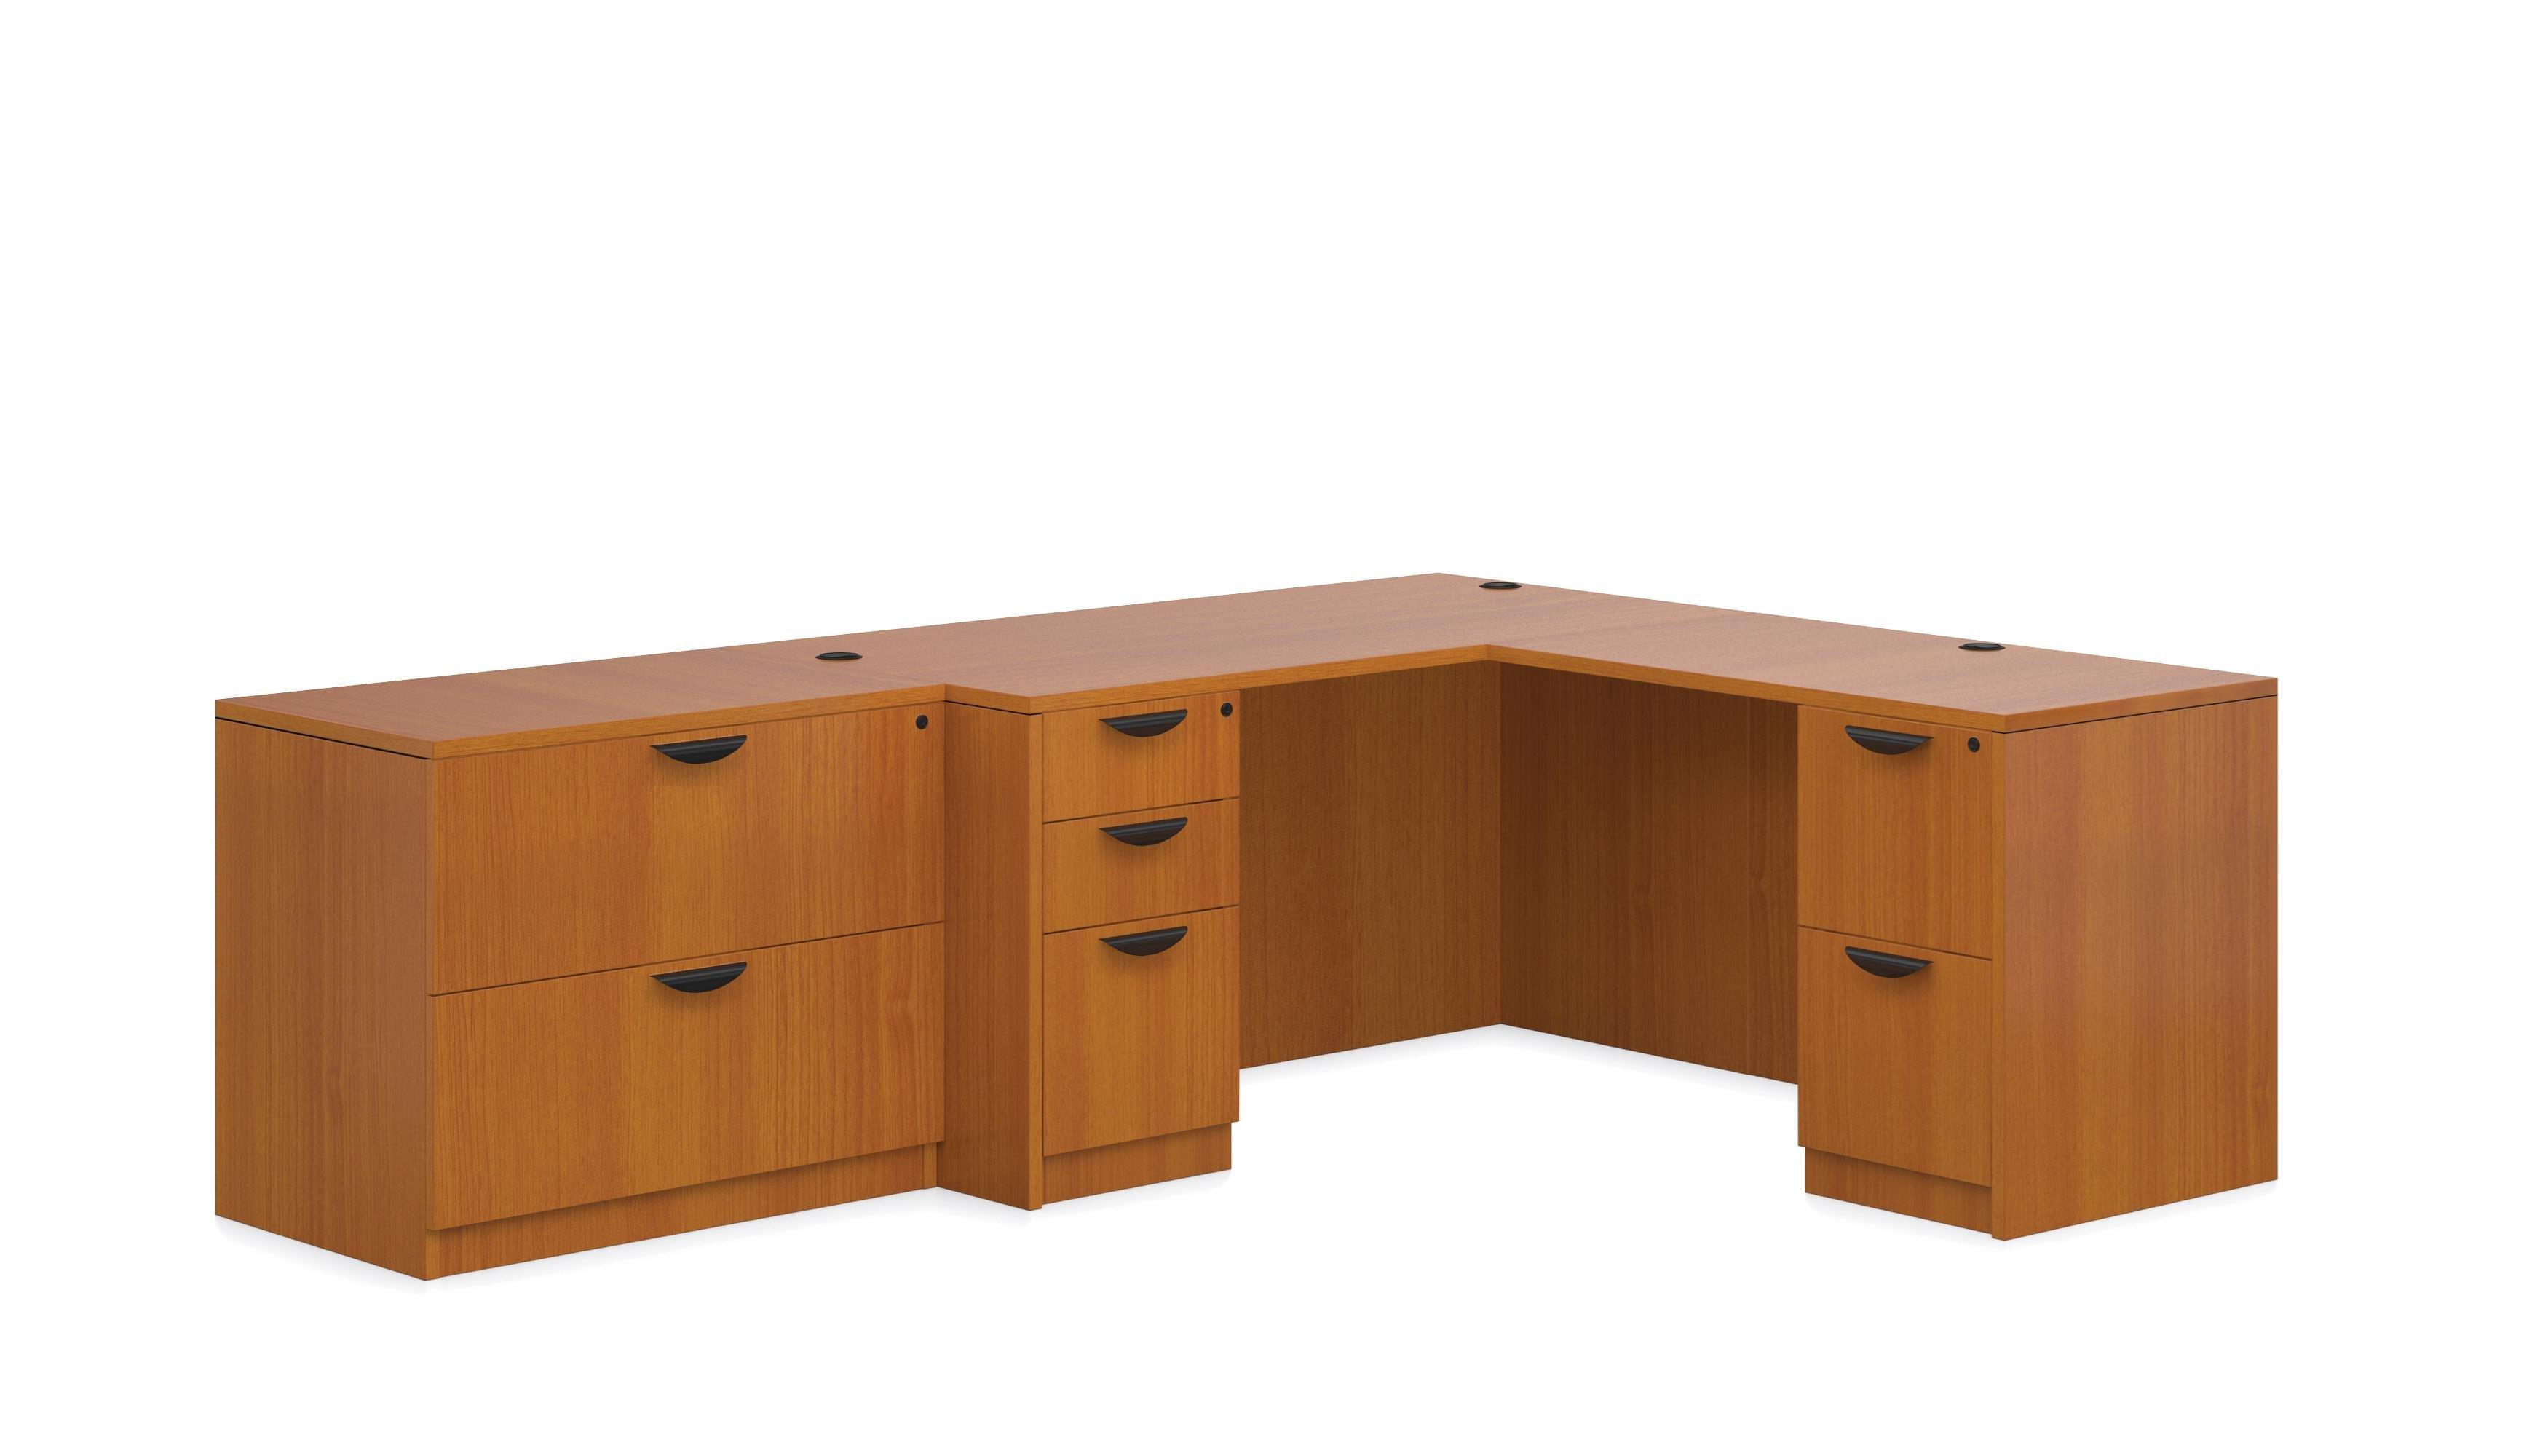 L Shaped Desk W/ 1 Box/Box/File Pedestal And 1 File/File Pedestal, U0026 A  Freestanding 2 Drawer Lateral File, American Cherry Finish